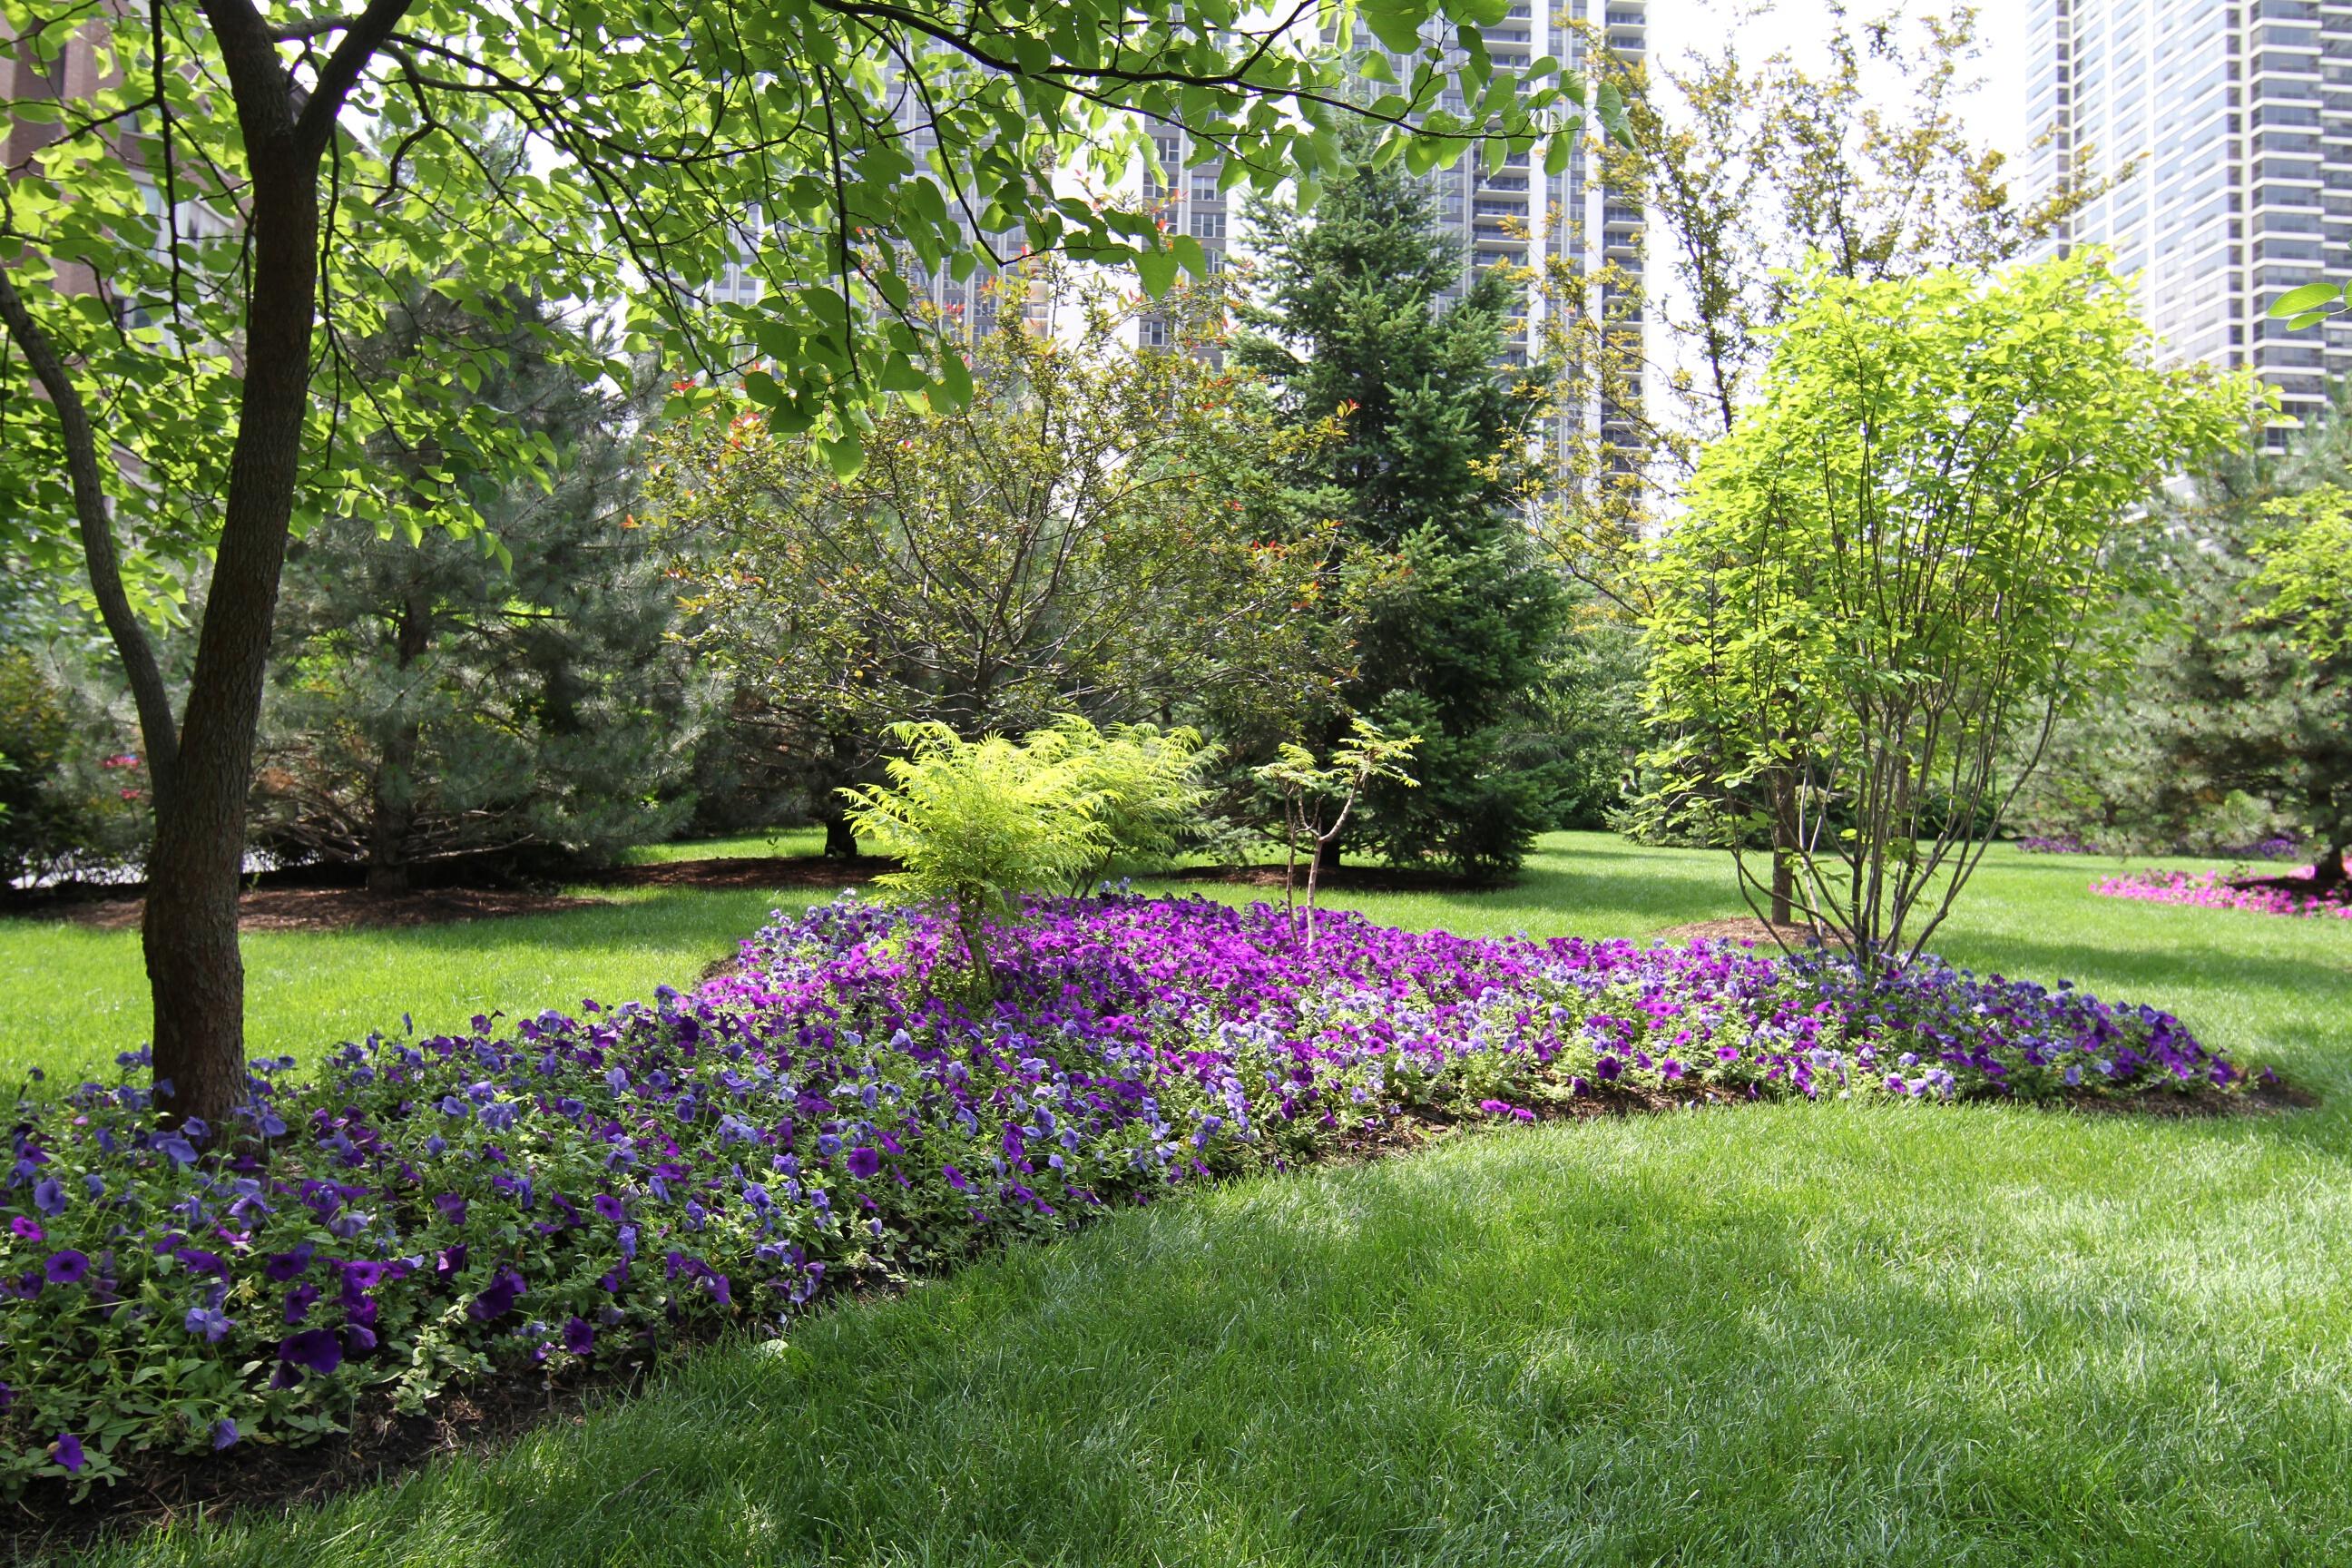 Sanctuary in the park 2